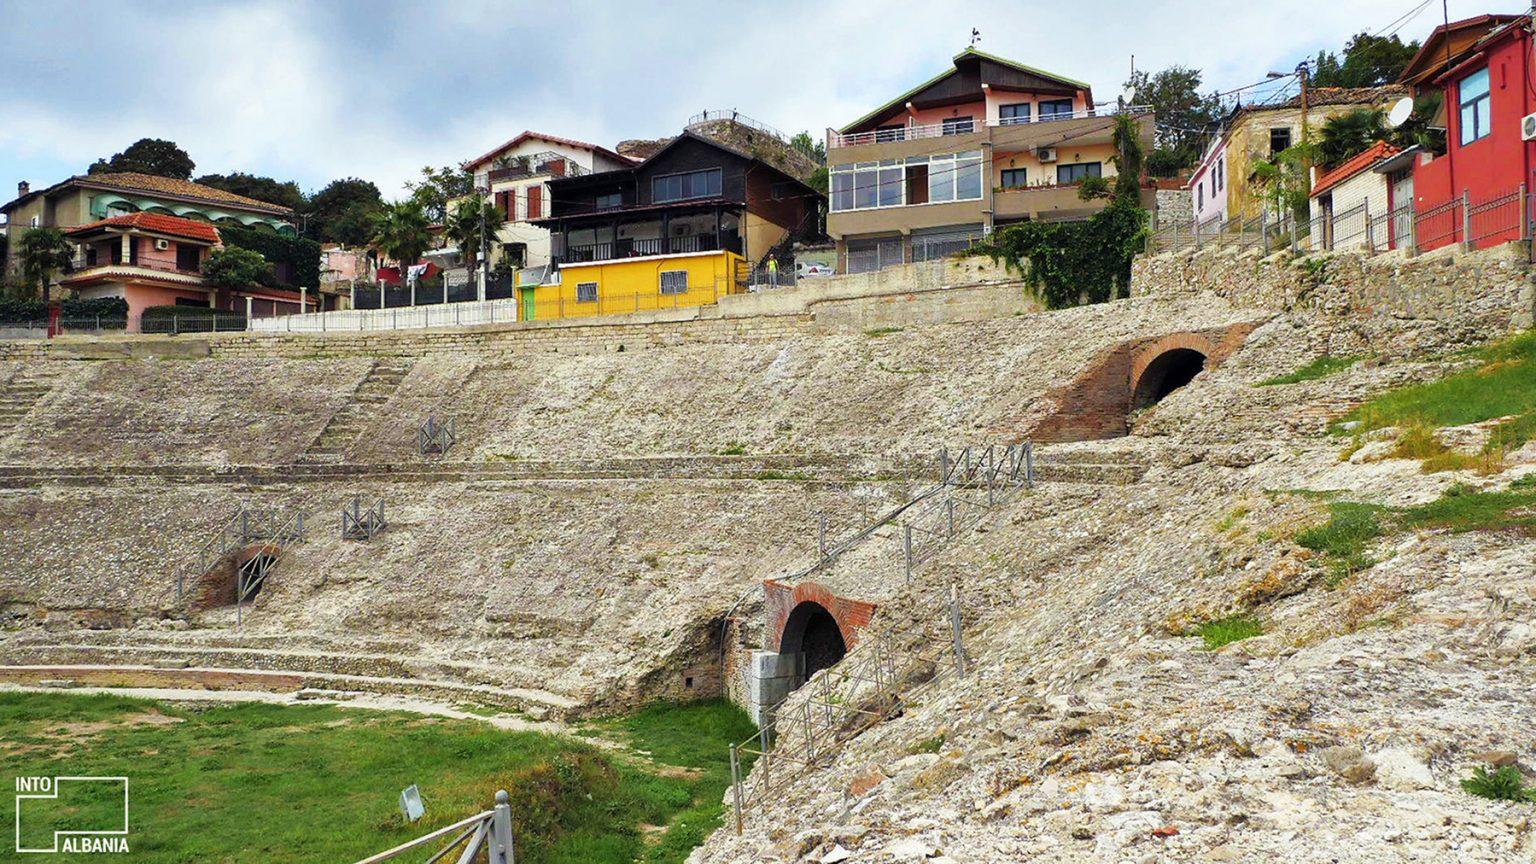 Amfiteatri i Durrësit, foto nga IntoAlbania